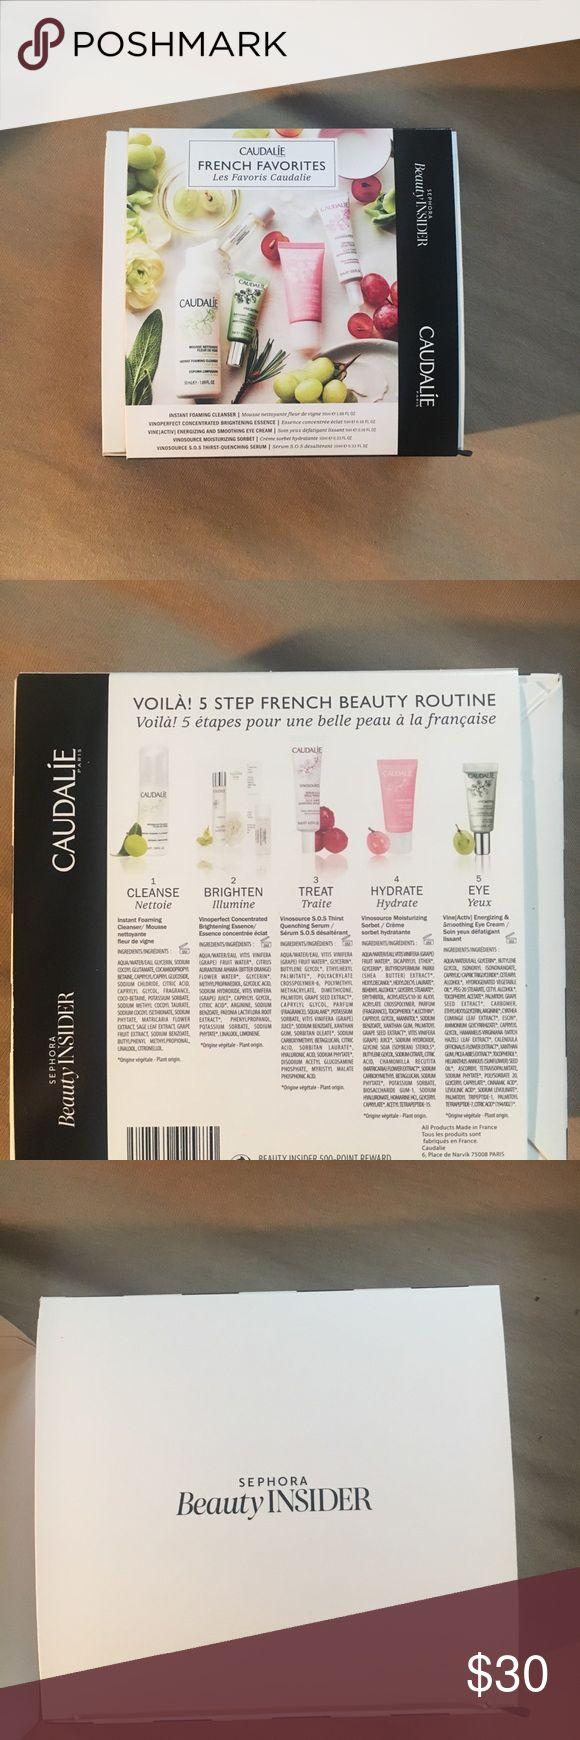 Sephora Gift Box: Brand New Caudalie French Favorites Gift Box NWT